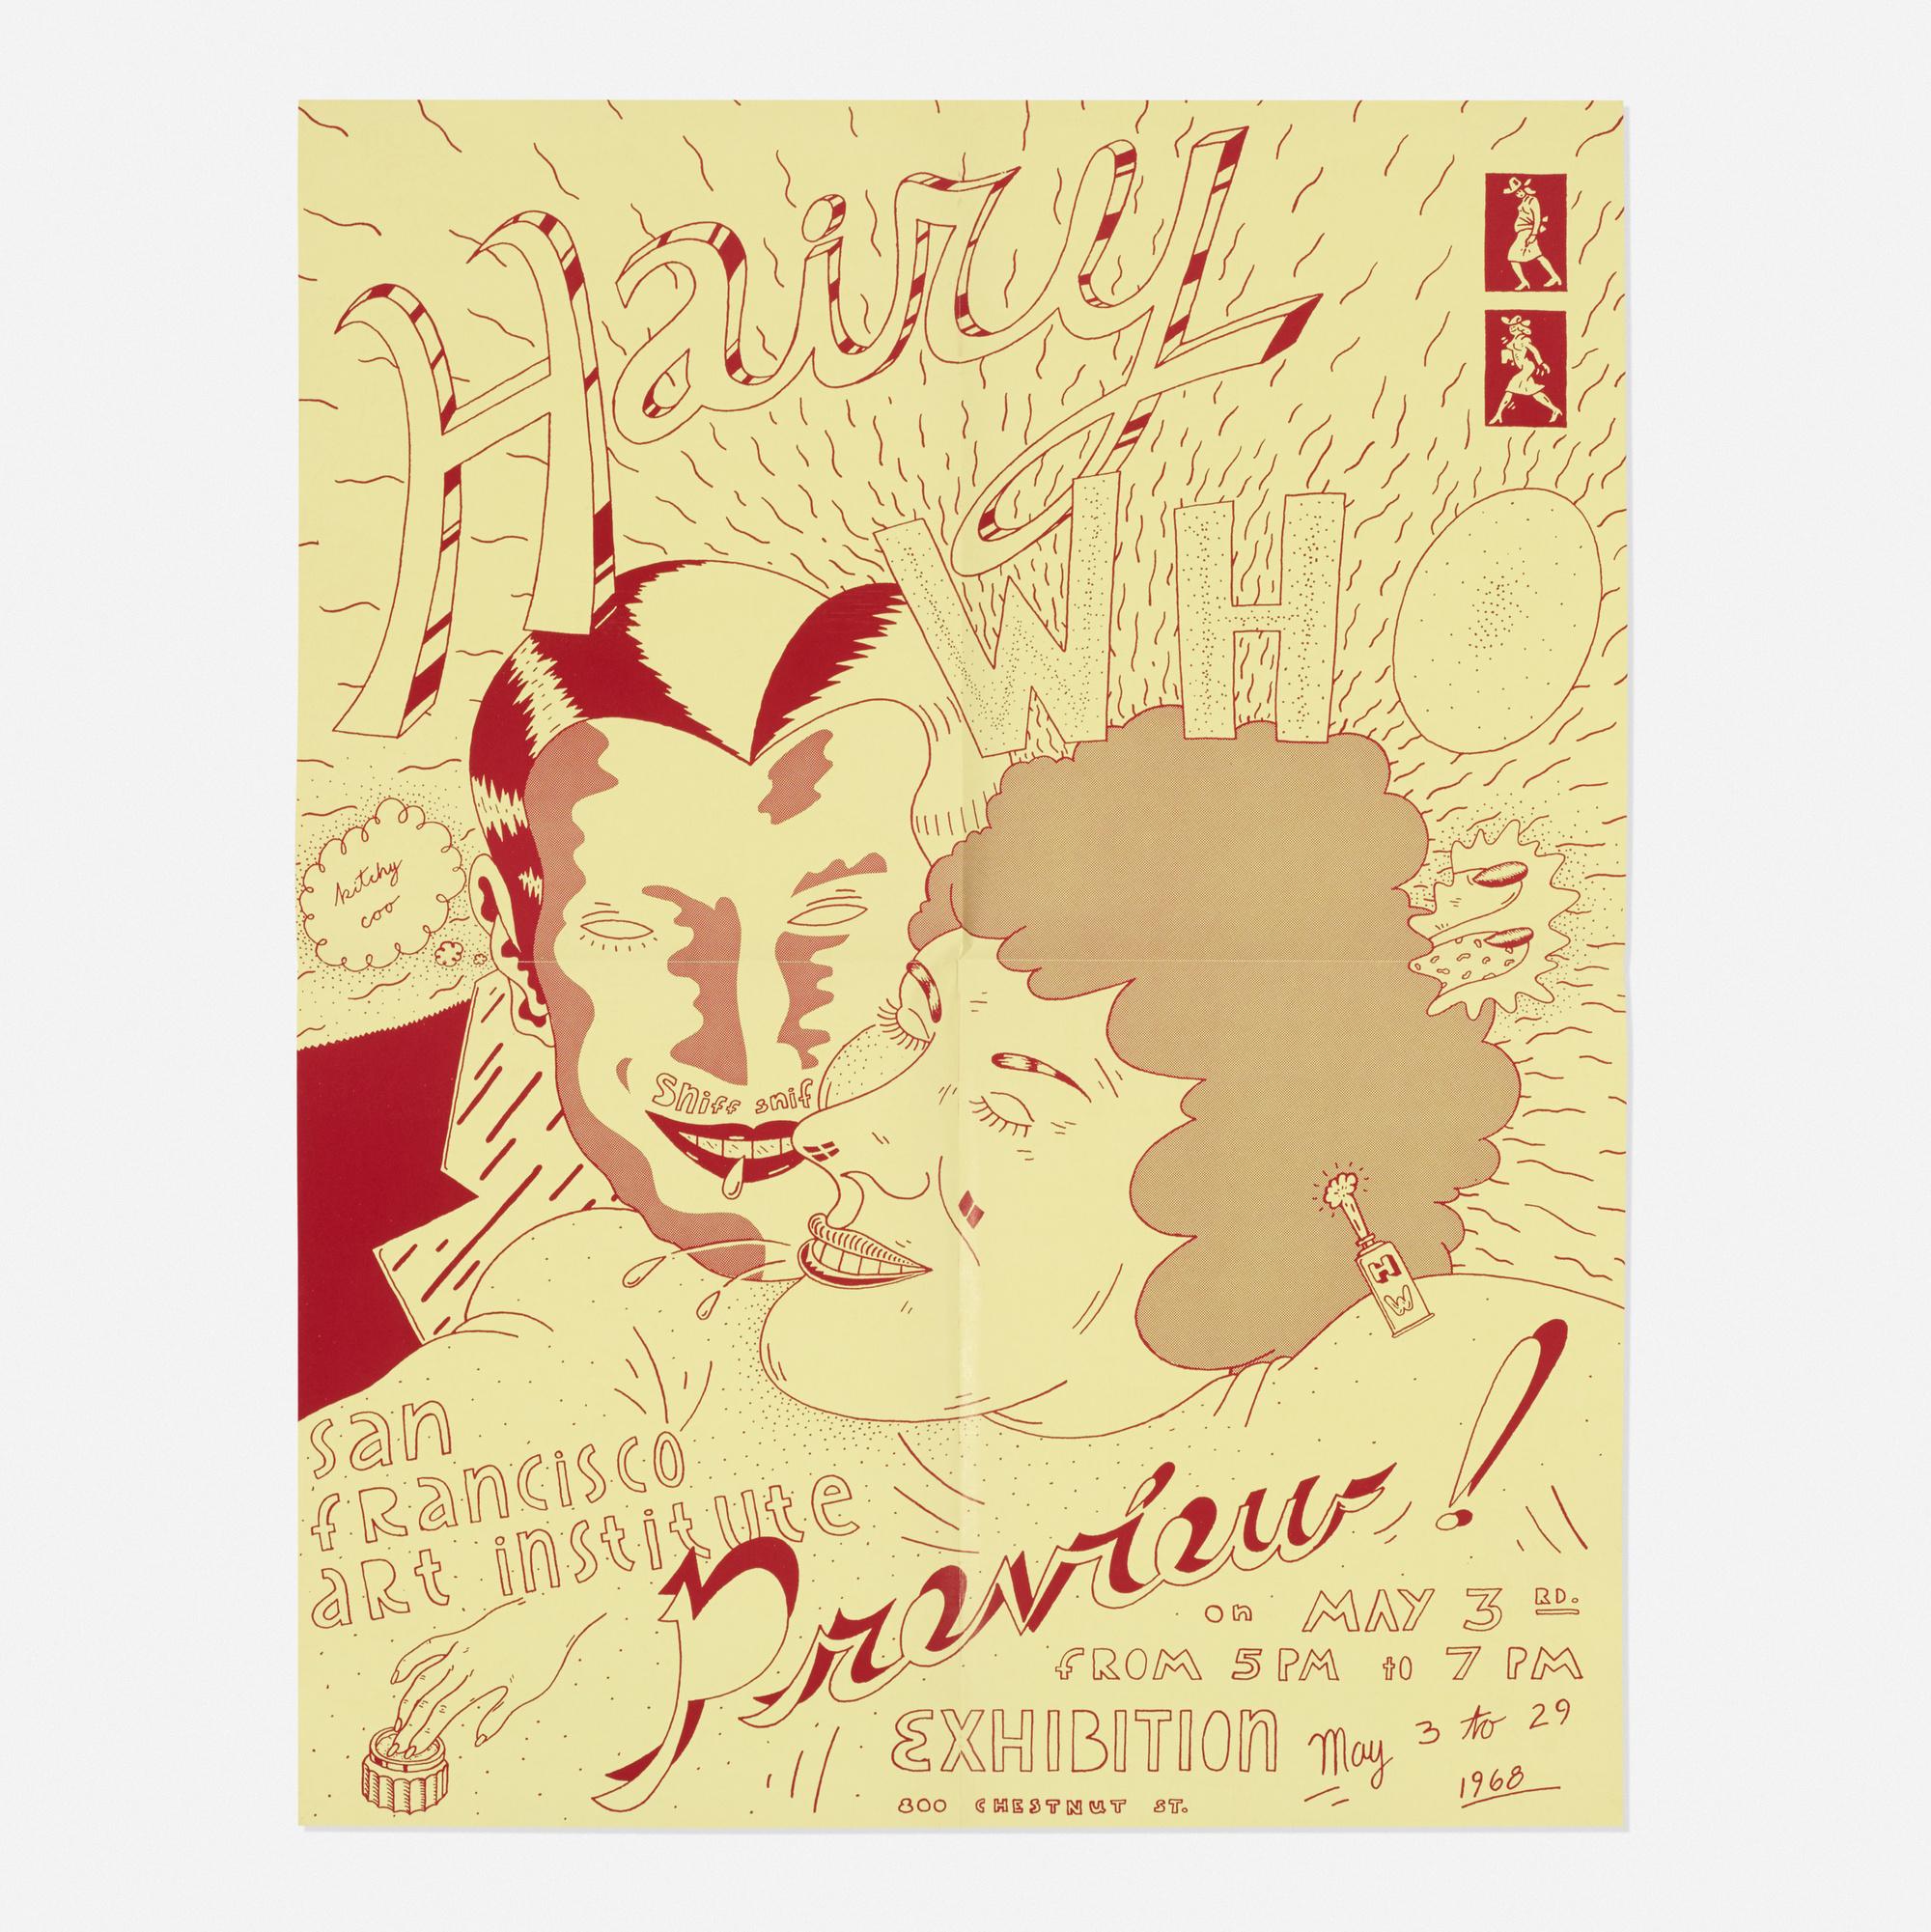 227: Jim Nutt / Untitled (exhibition poster for the San Franscisco Art Institute) (1 of 1)